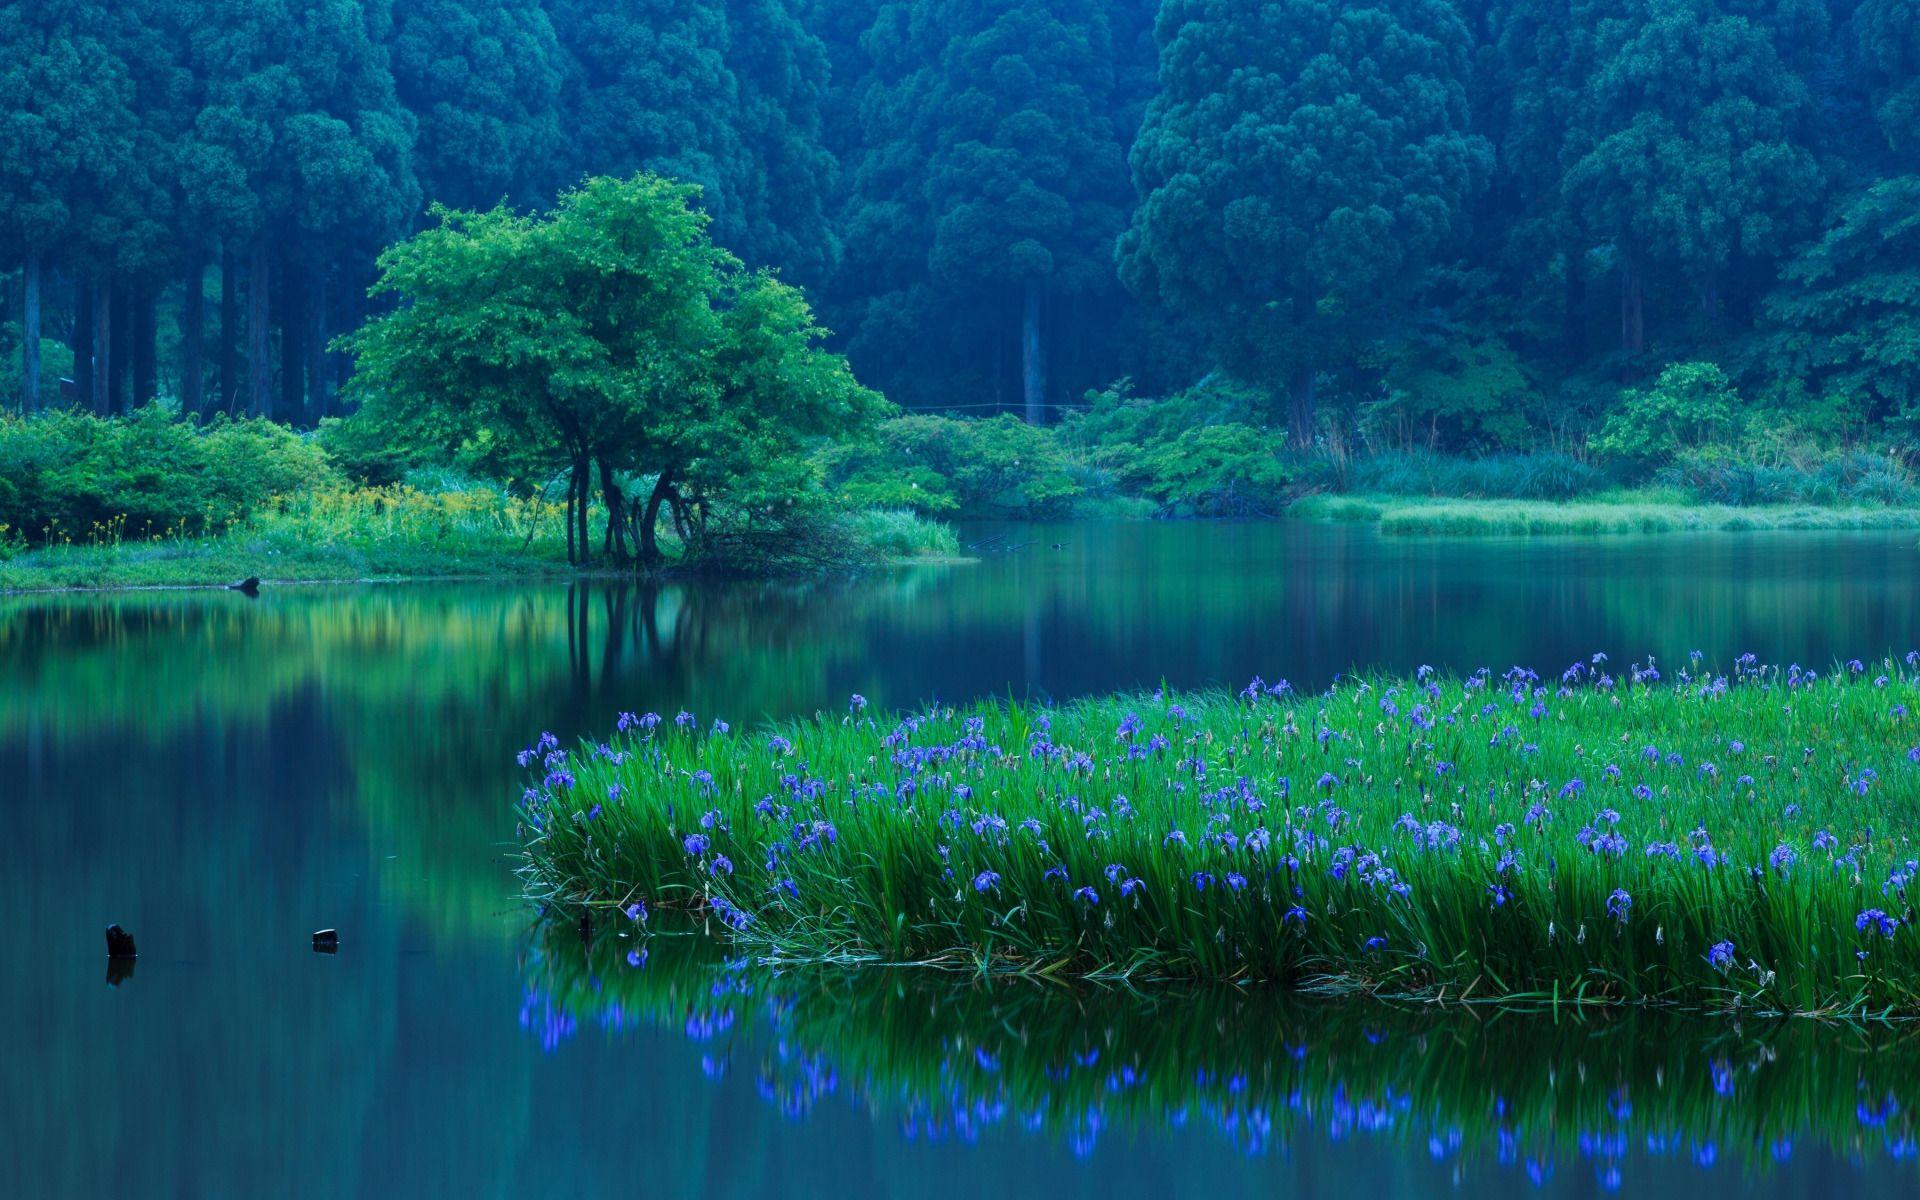 картинки на рабочий стол на синем фоне природа